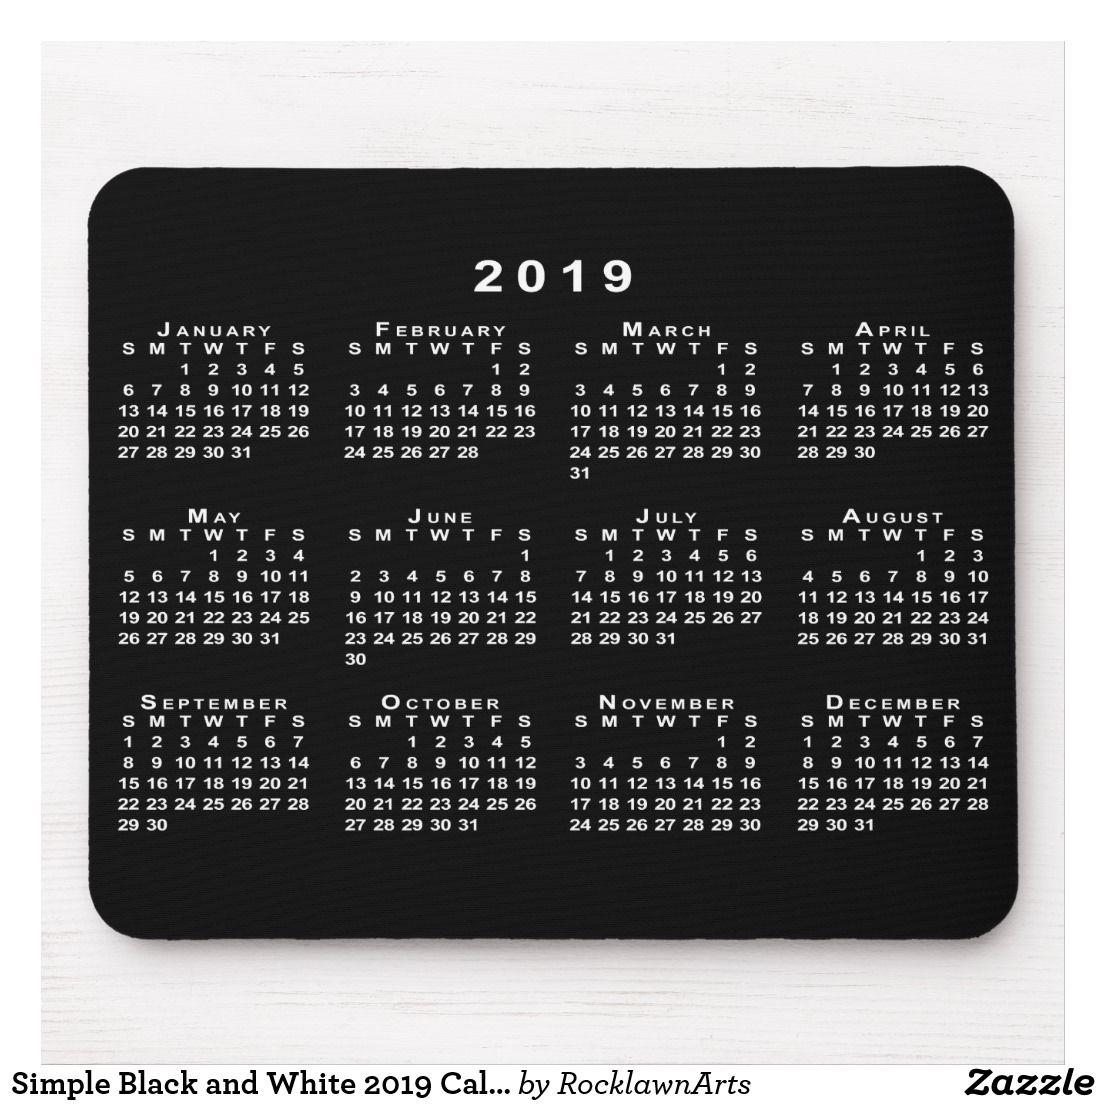 одета темно-красную календарь без цифр фото зависит ширины